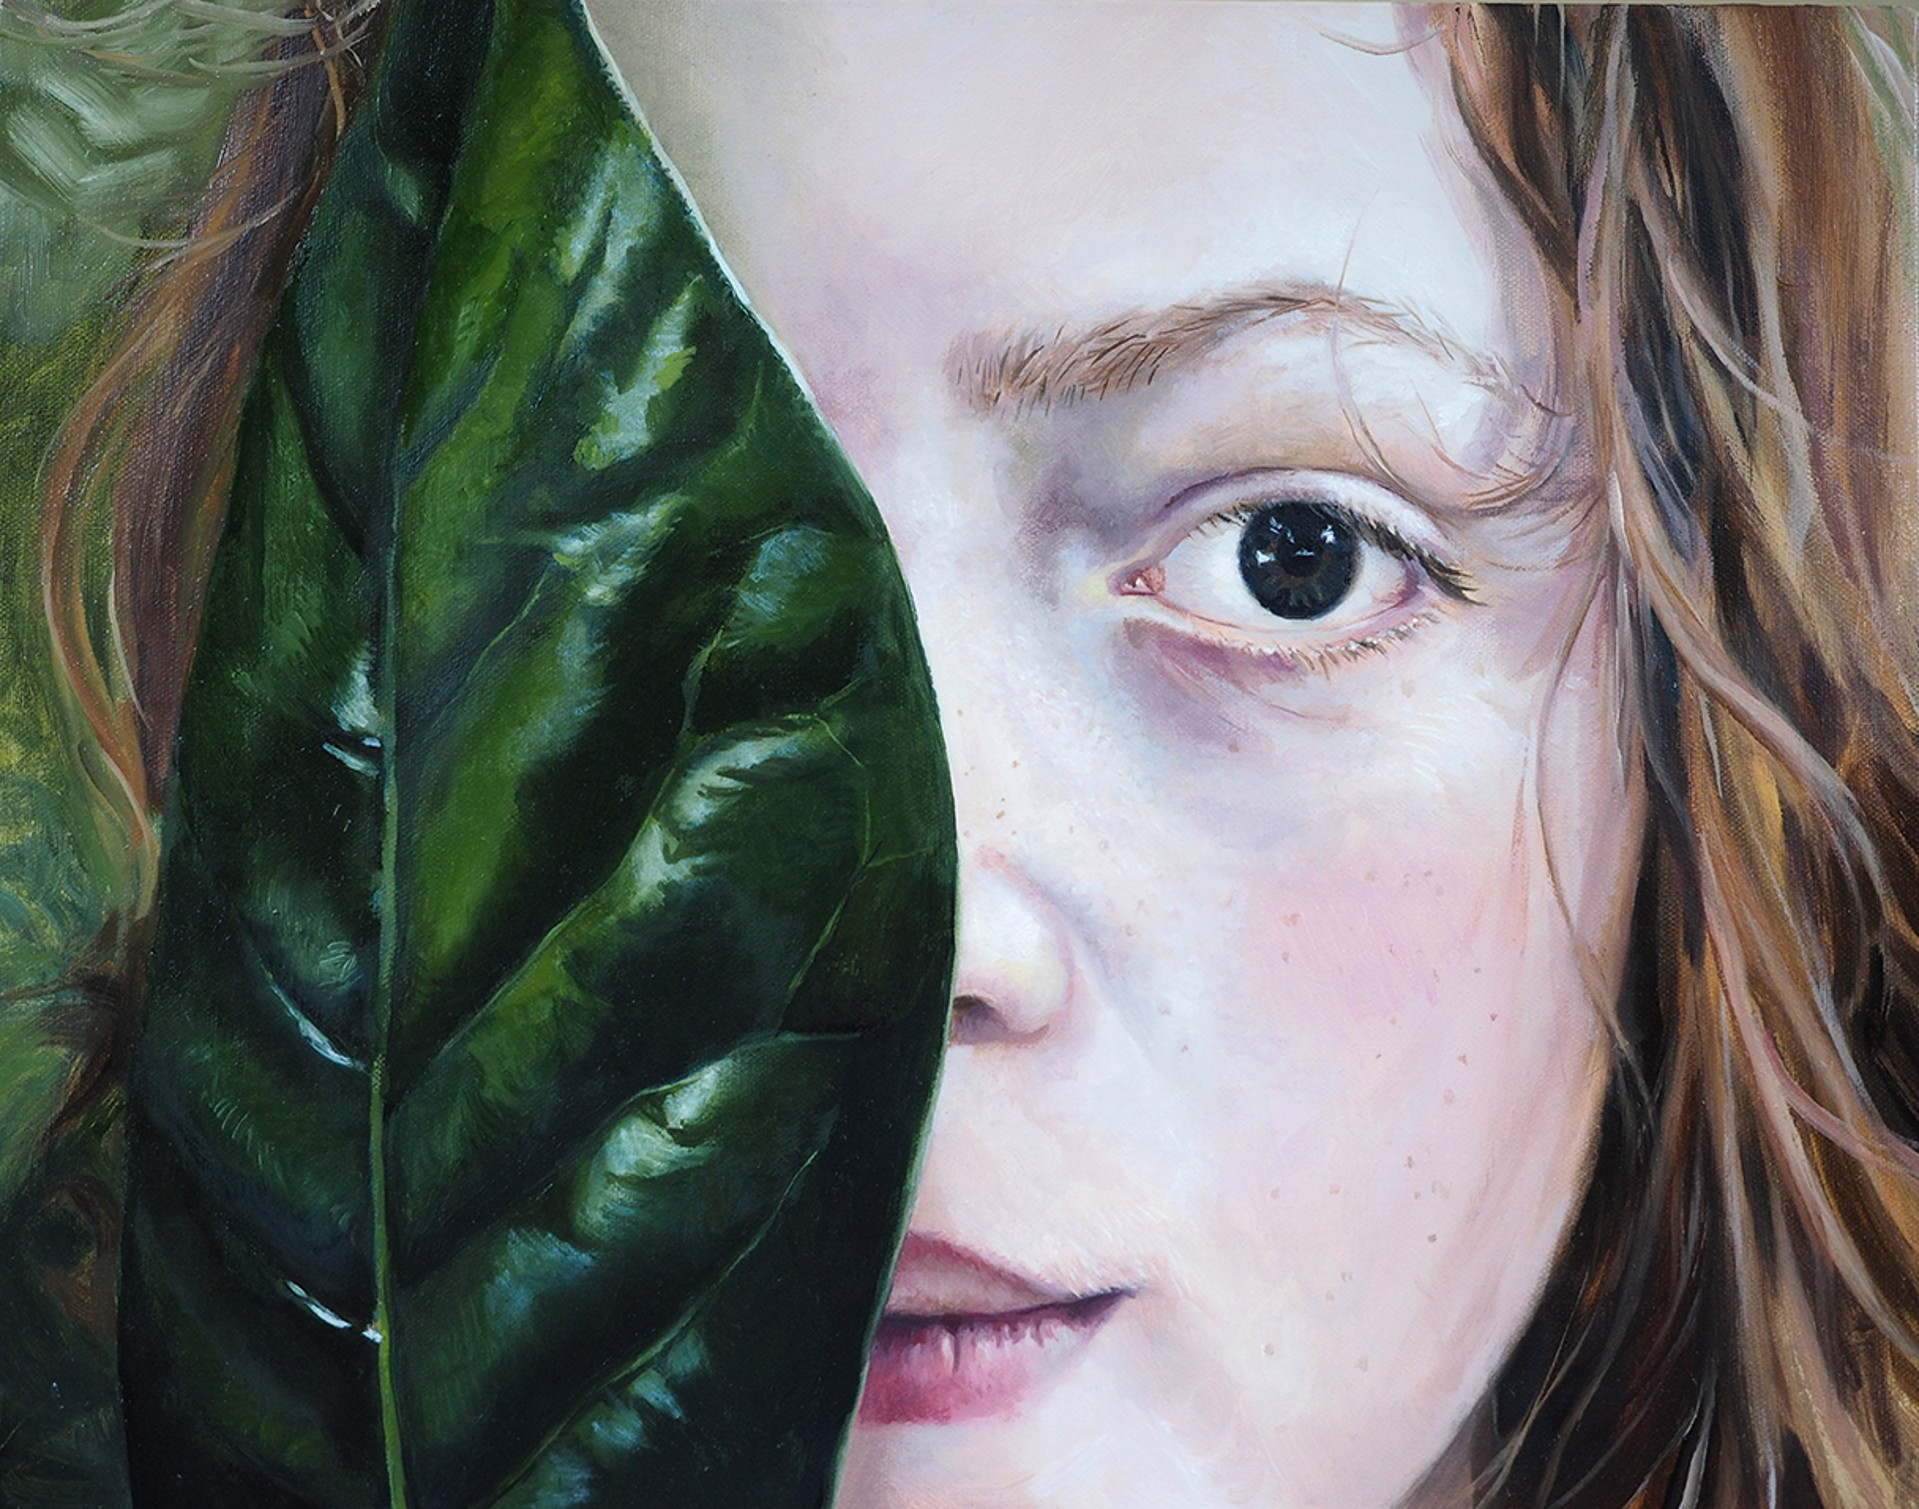 Magnolia by Denise M. Fulton